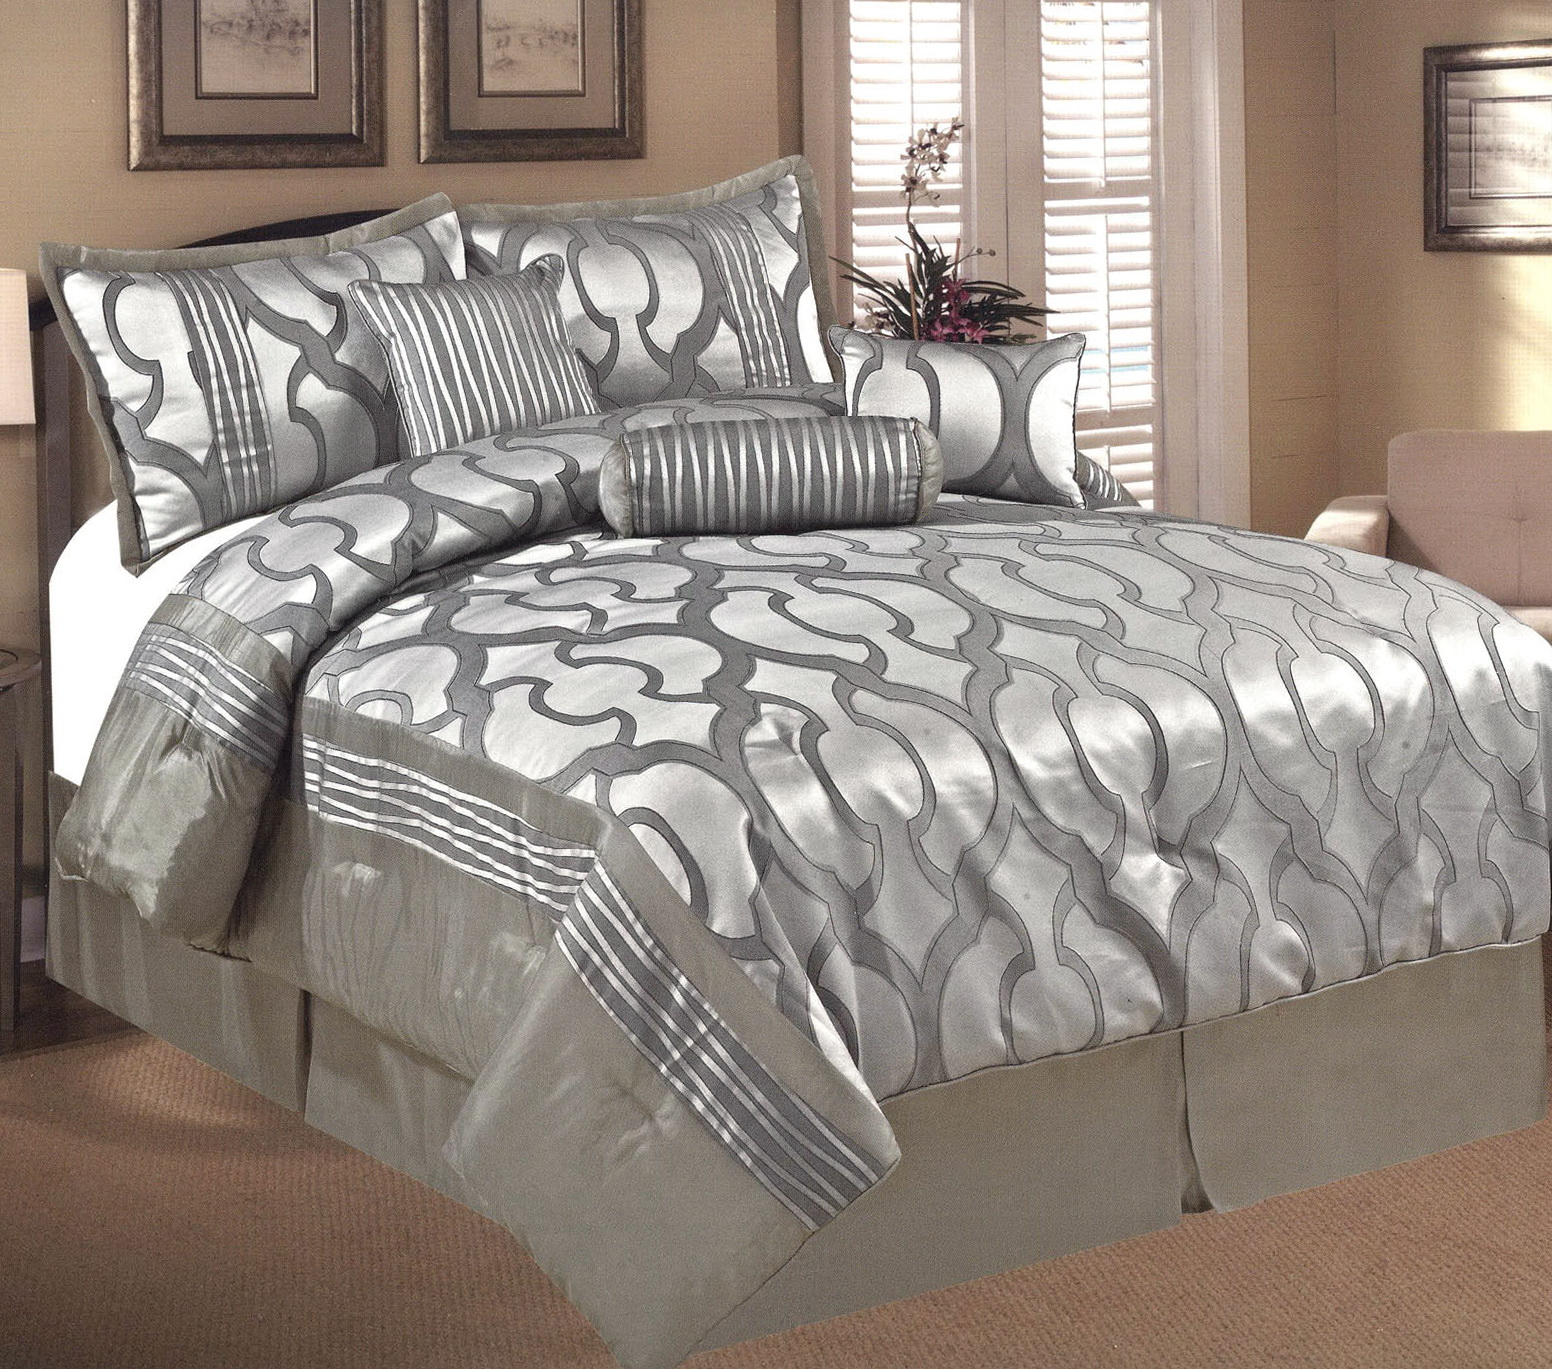 Grey Bedding Sets King